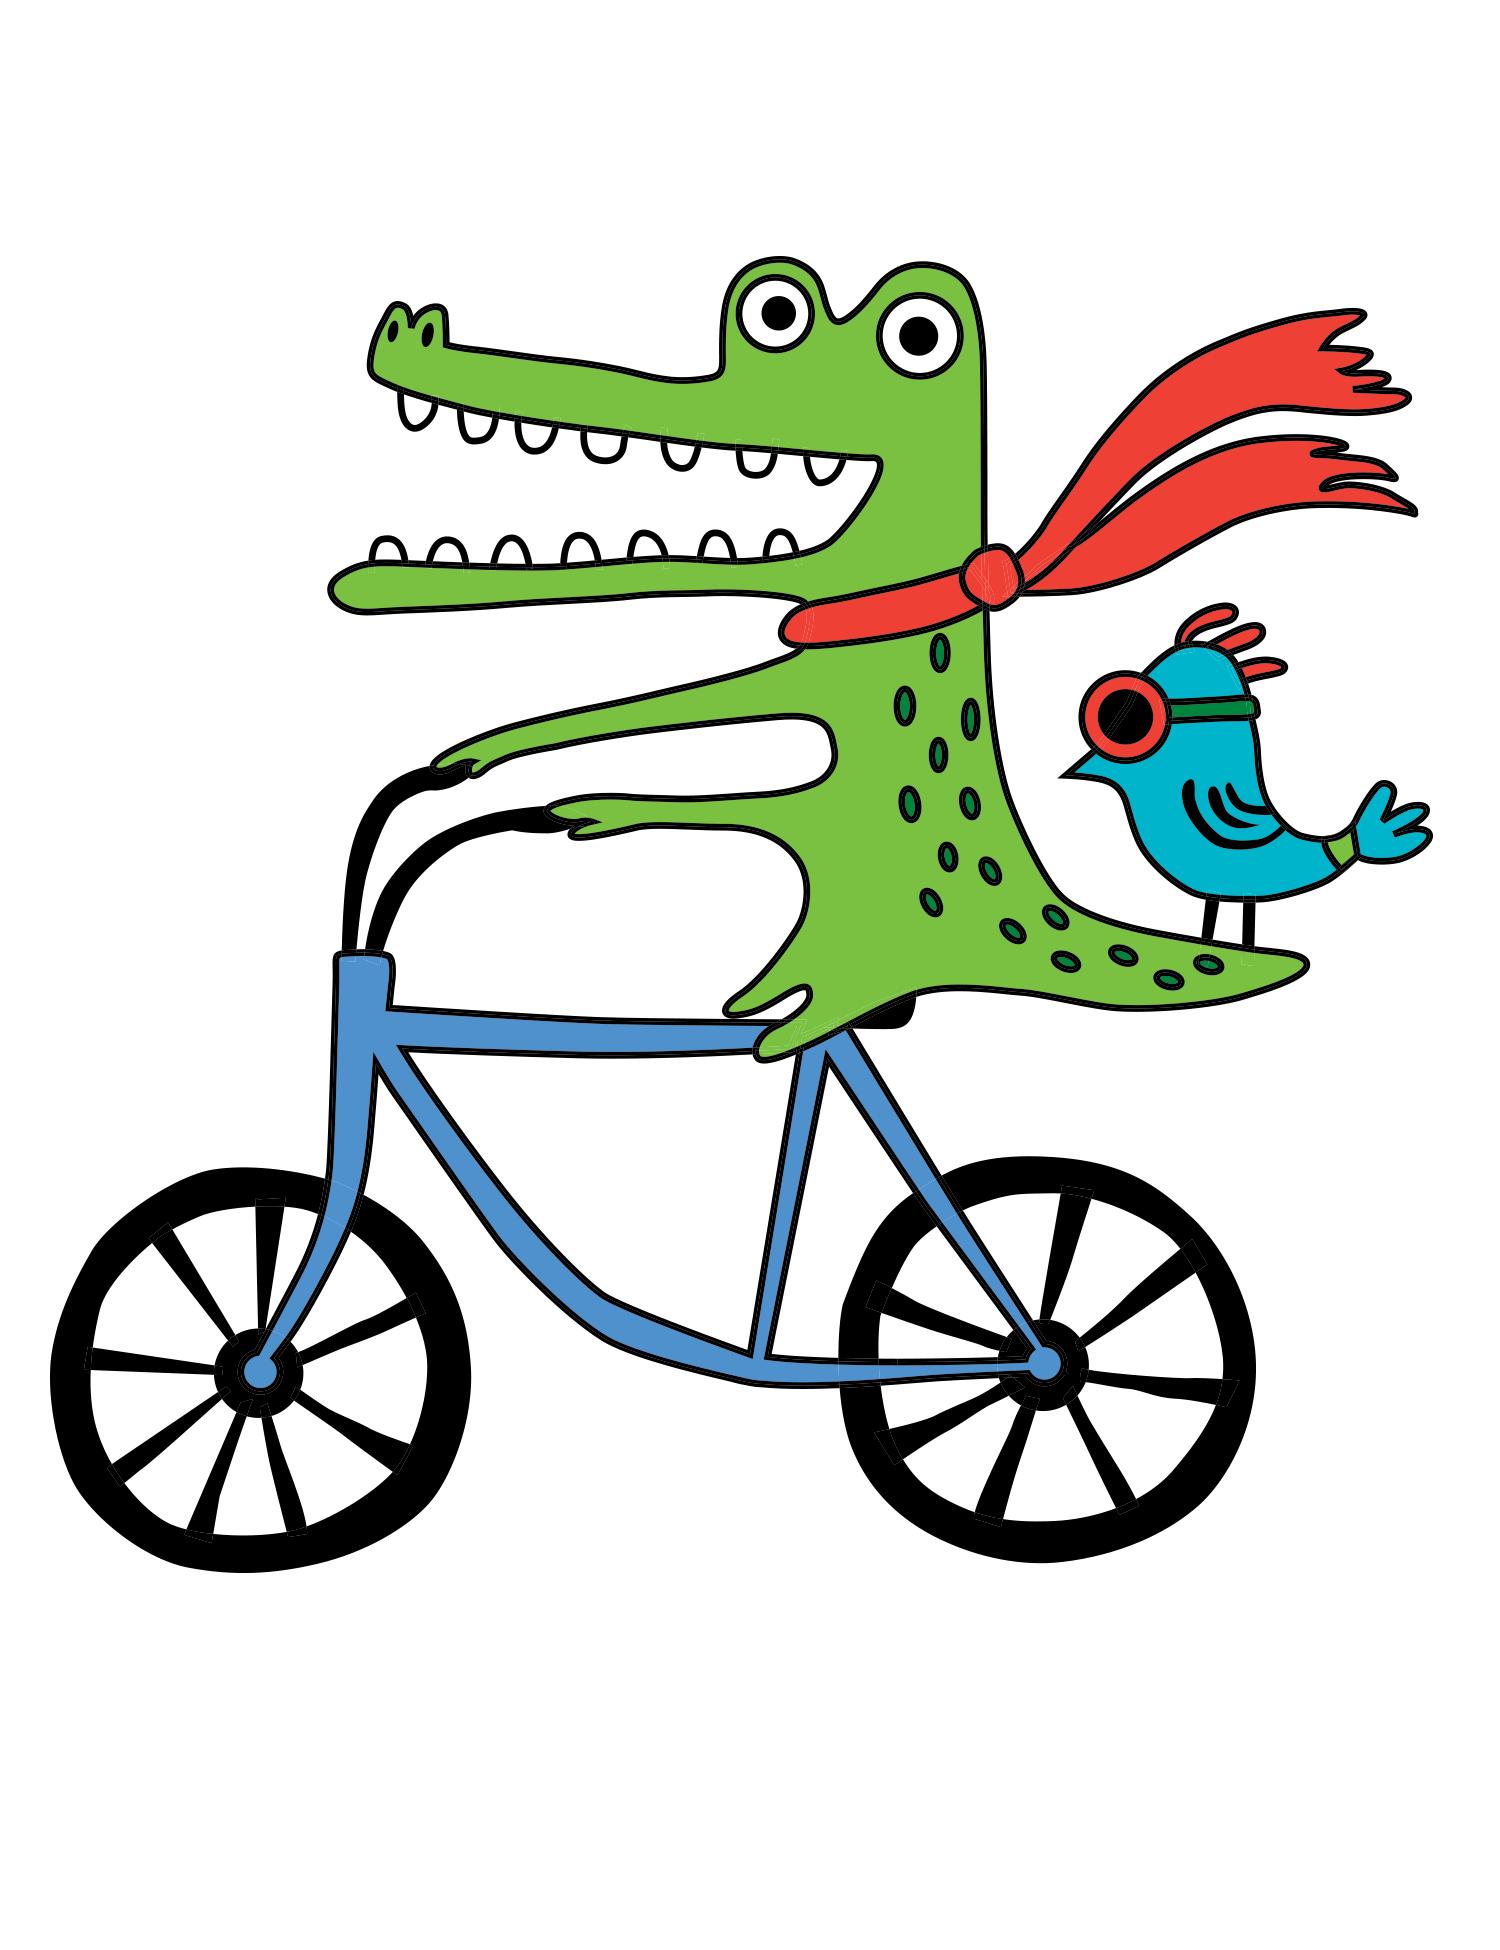 crocodile_on_bike_alligator_andi_bird.png